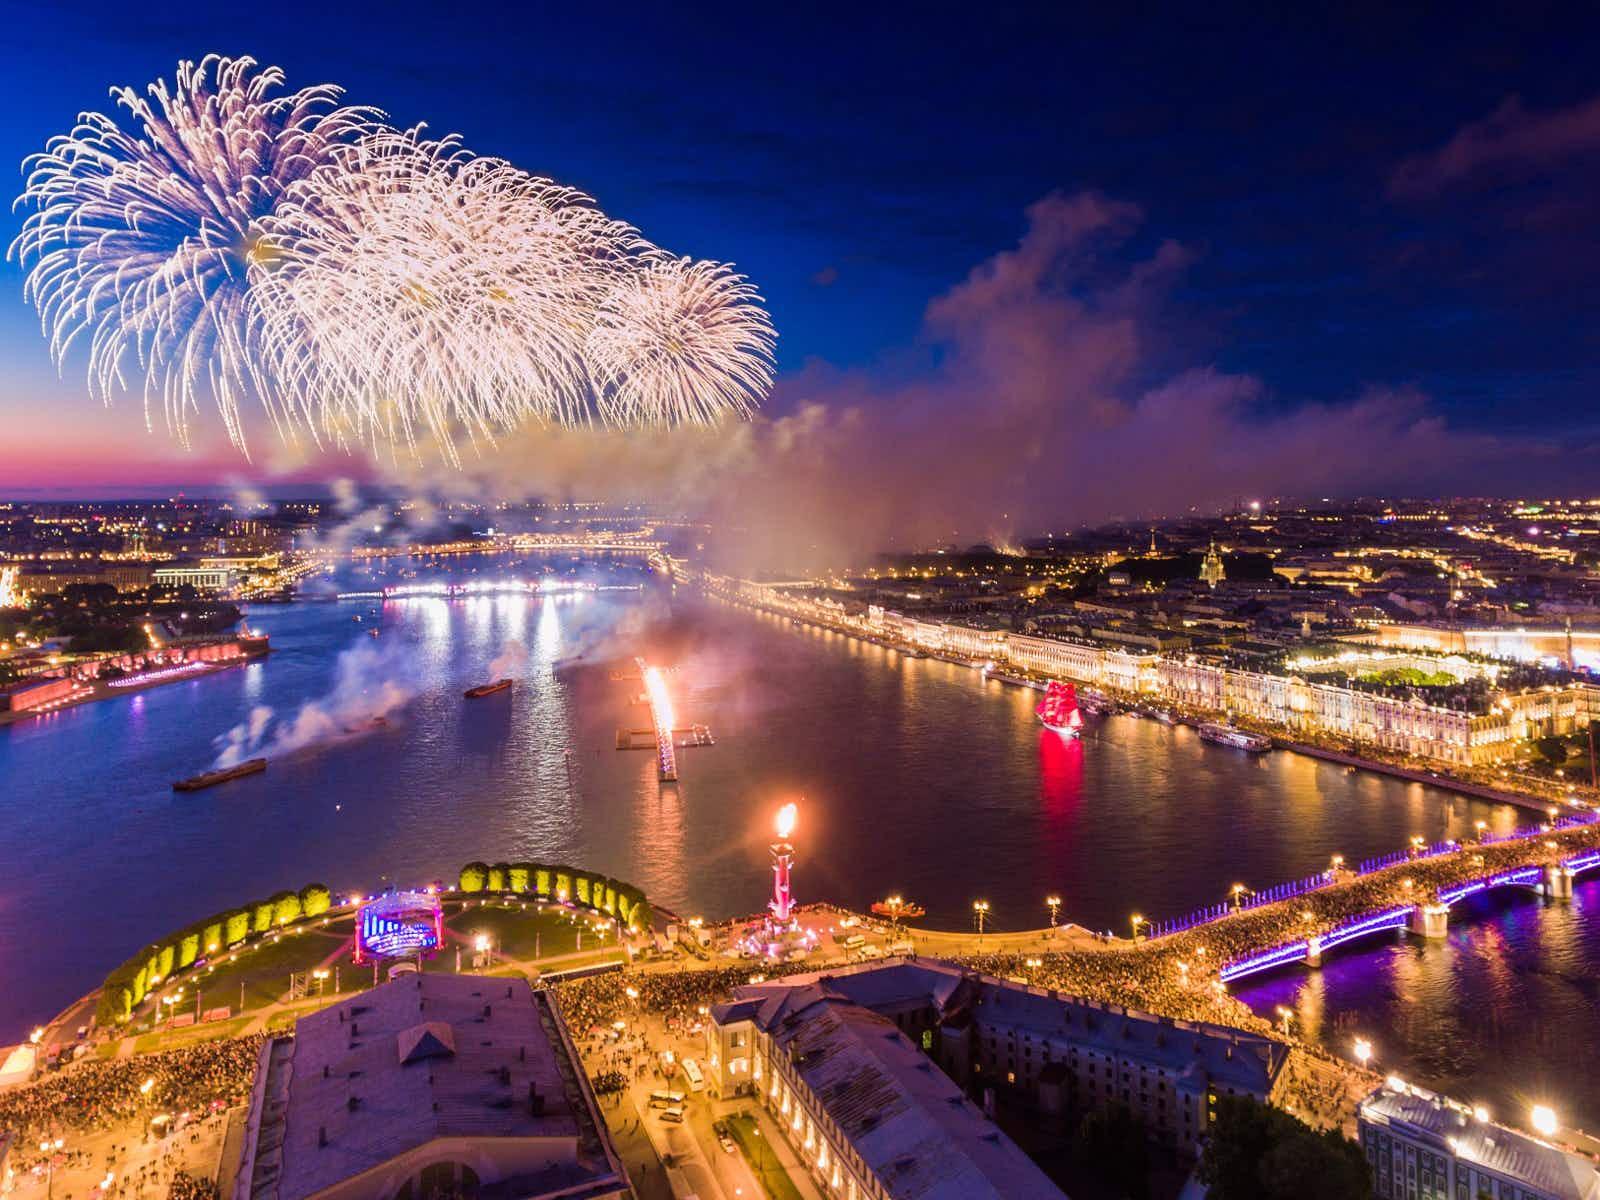 The Scarlet Sails fireworks over the Neva River and Palace Bridge © Drozdin Vladimir / Shutterstock